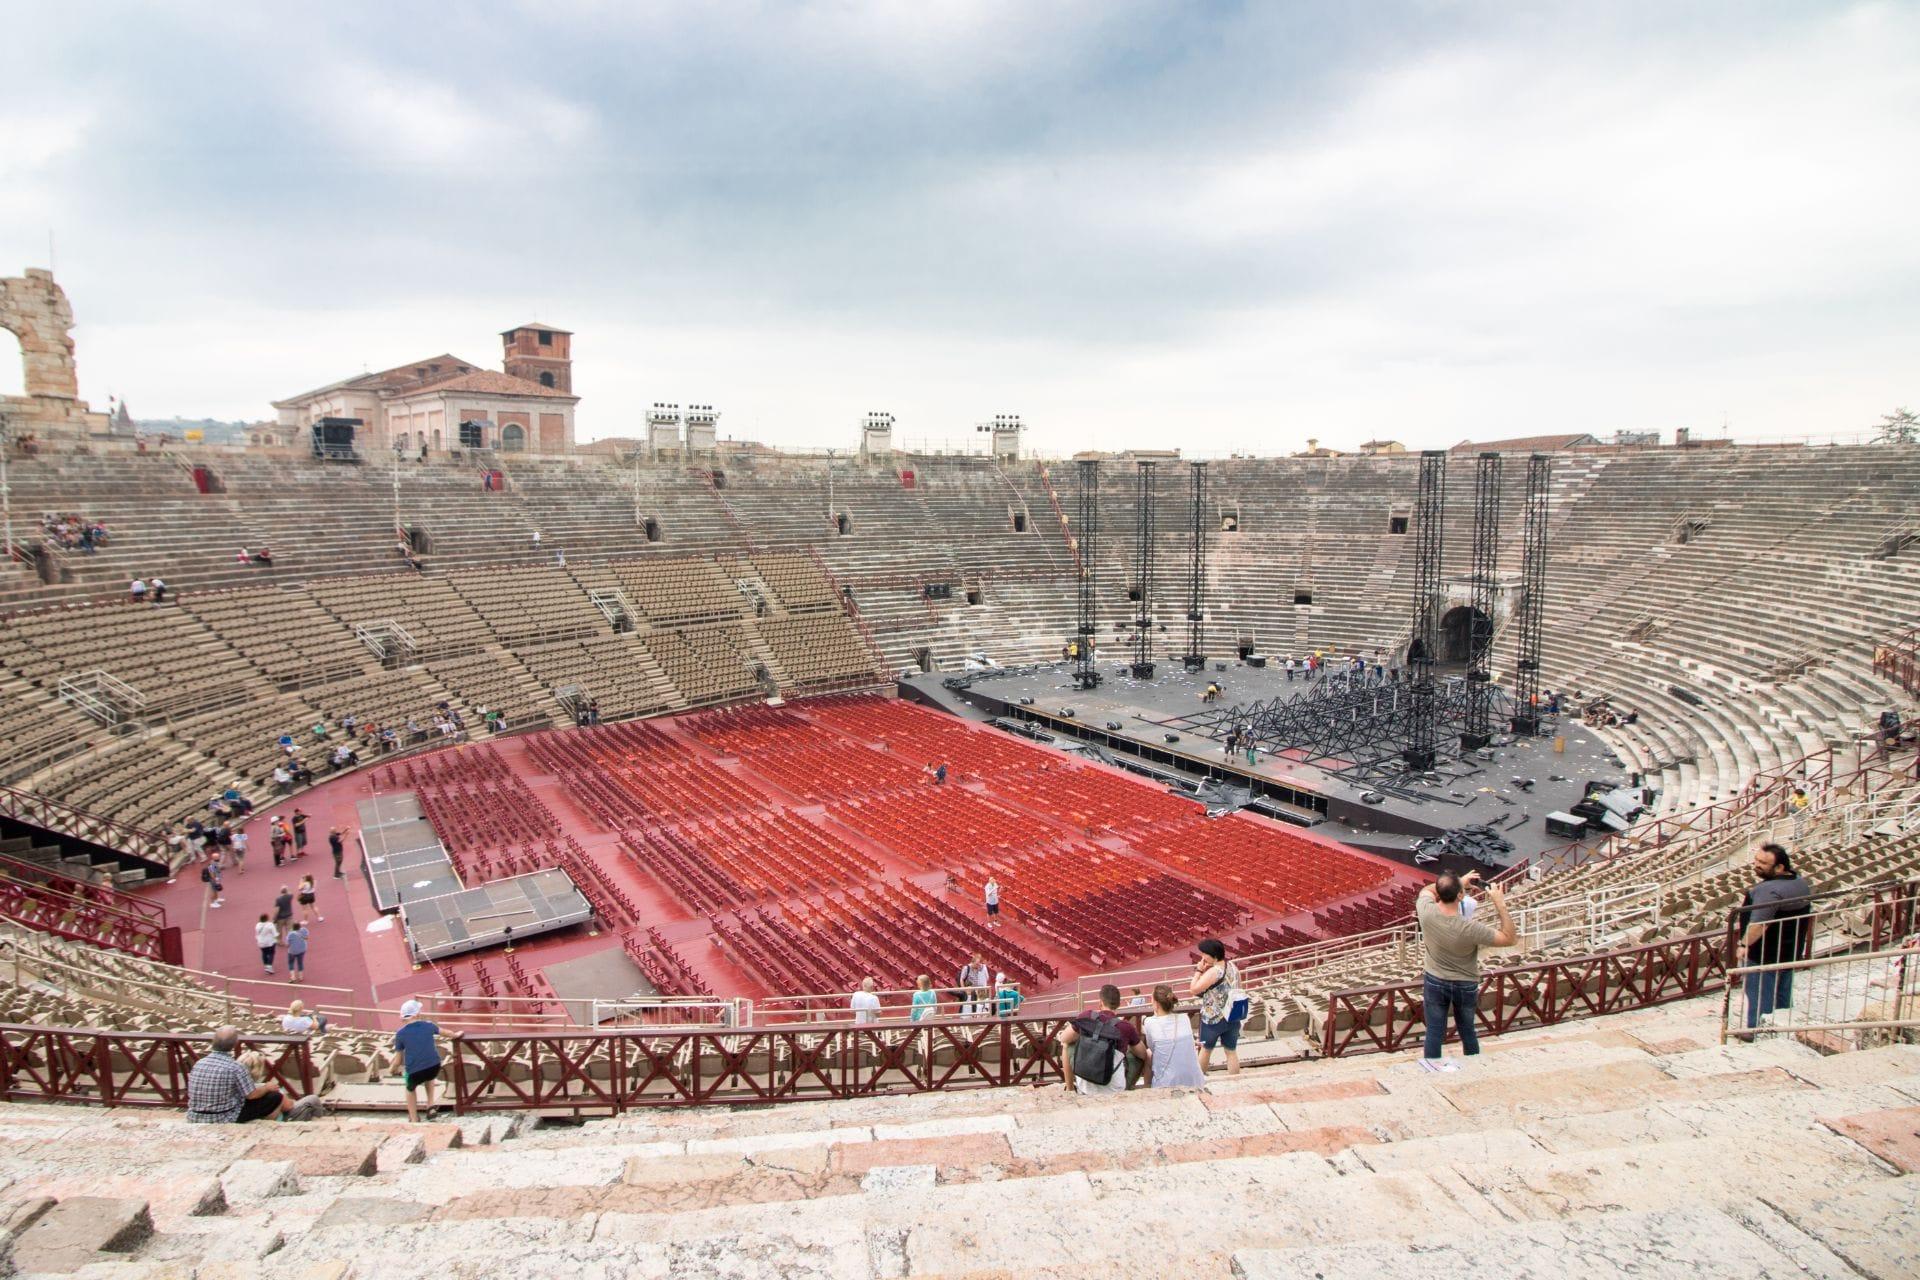 historic-roman-ampitheatre-in-italy-verona-arena